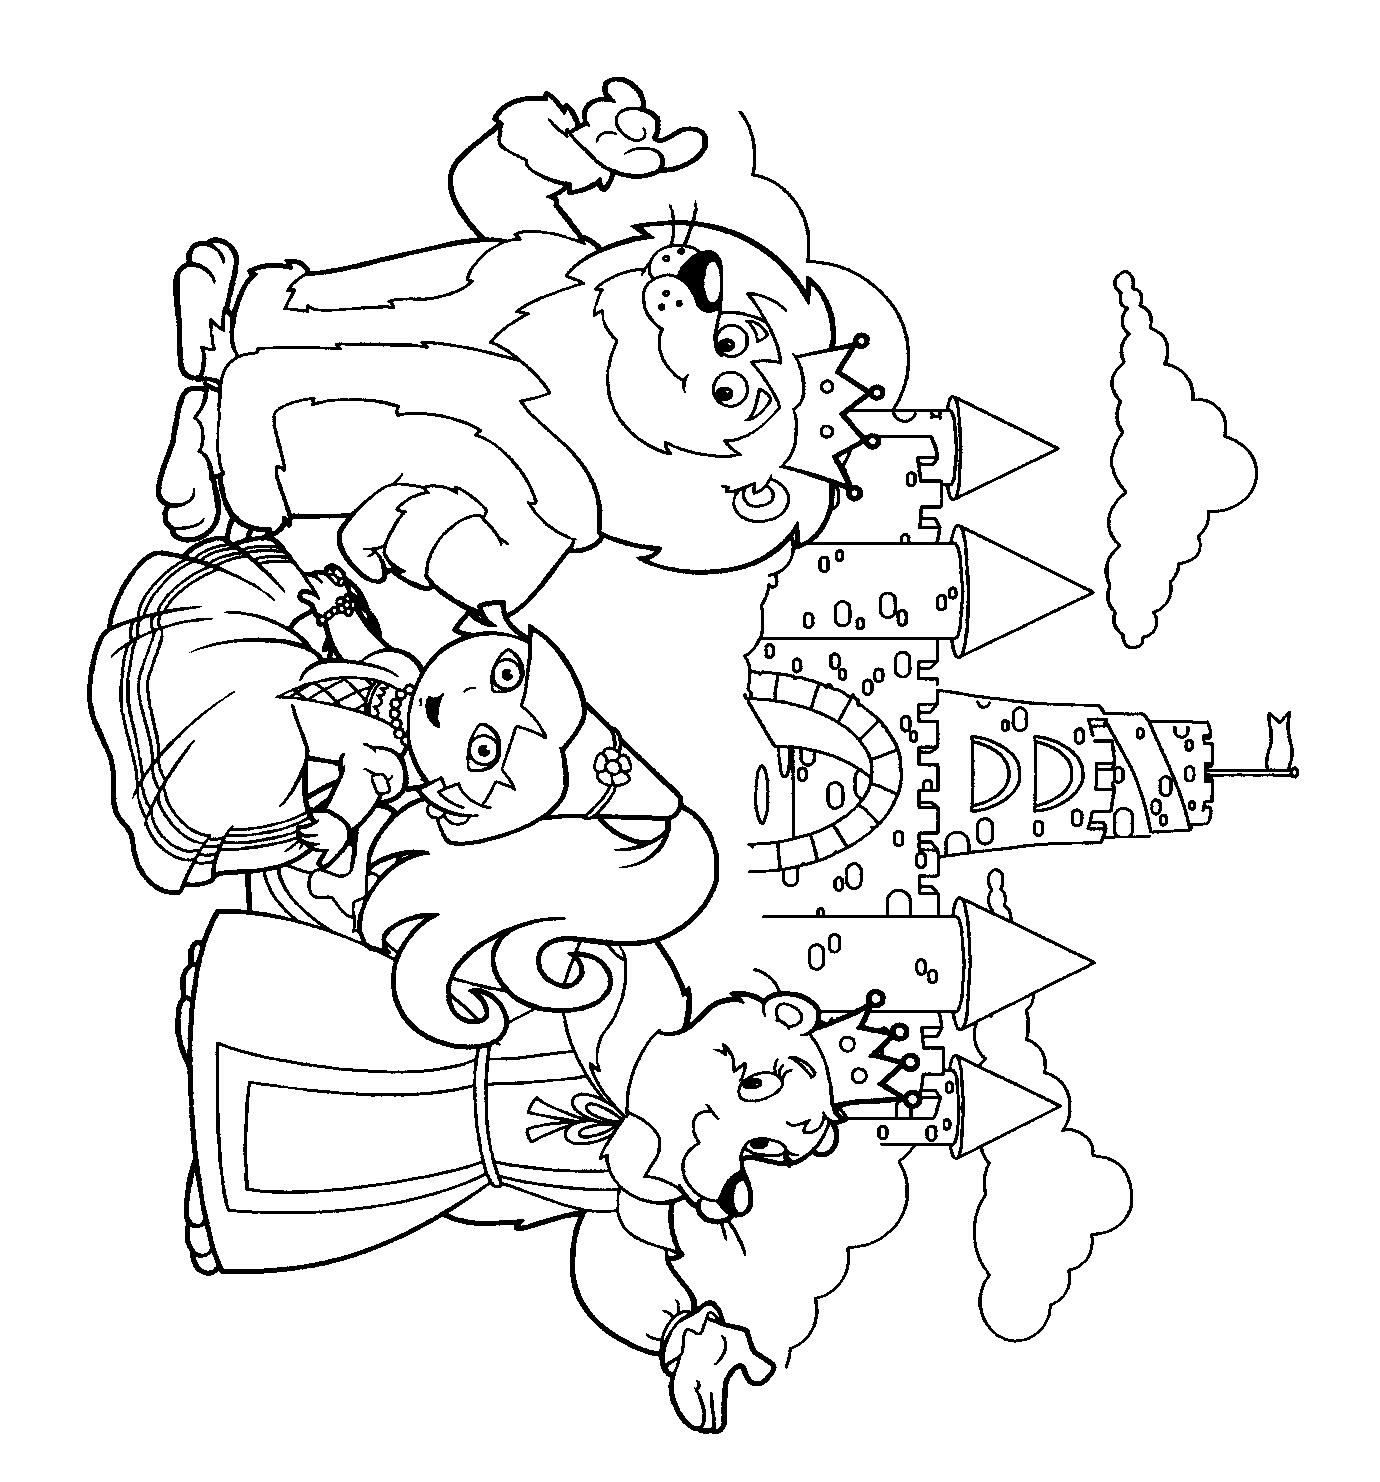 Dora the Explorer Coloring Pages (17)